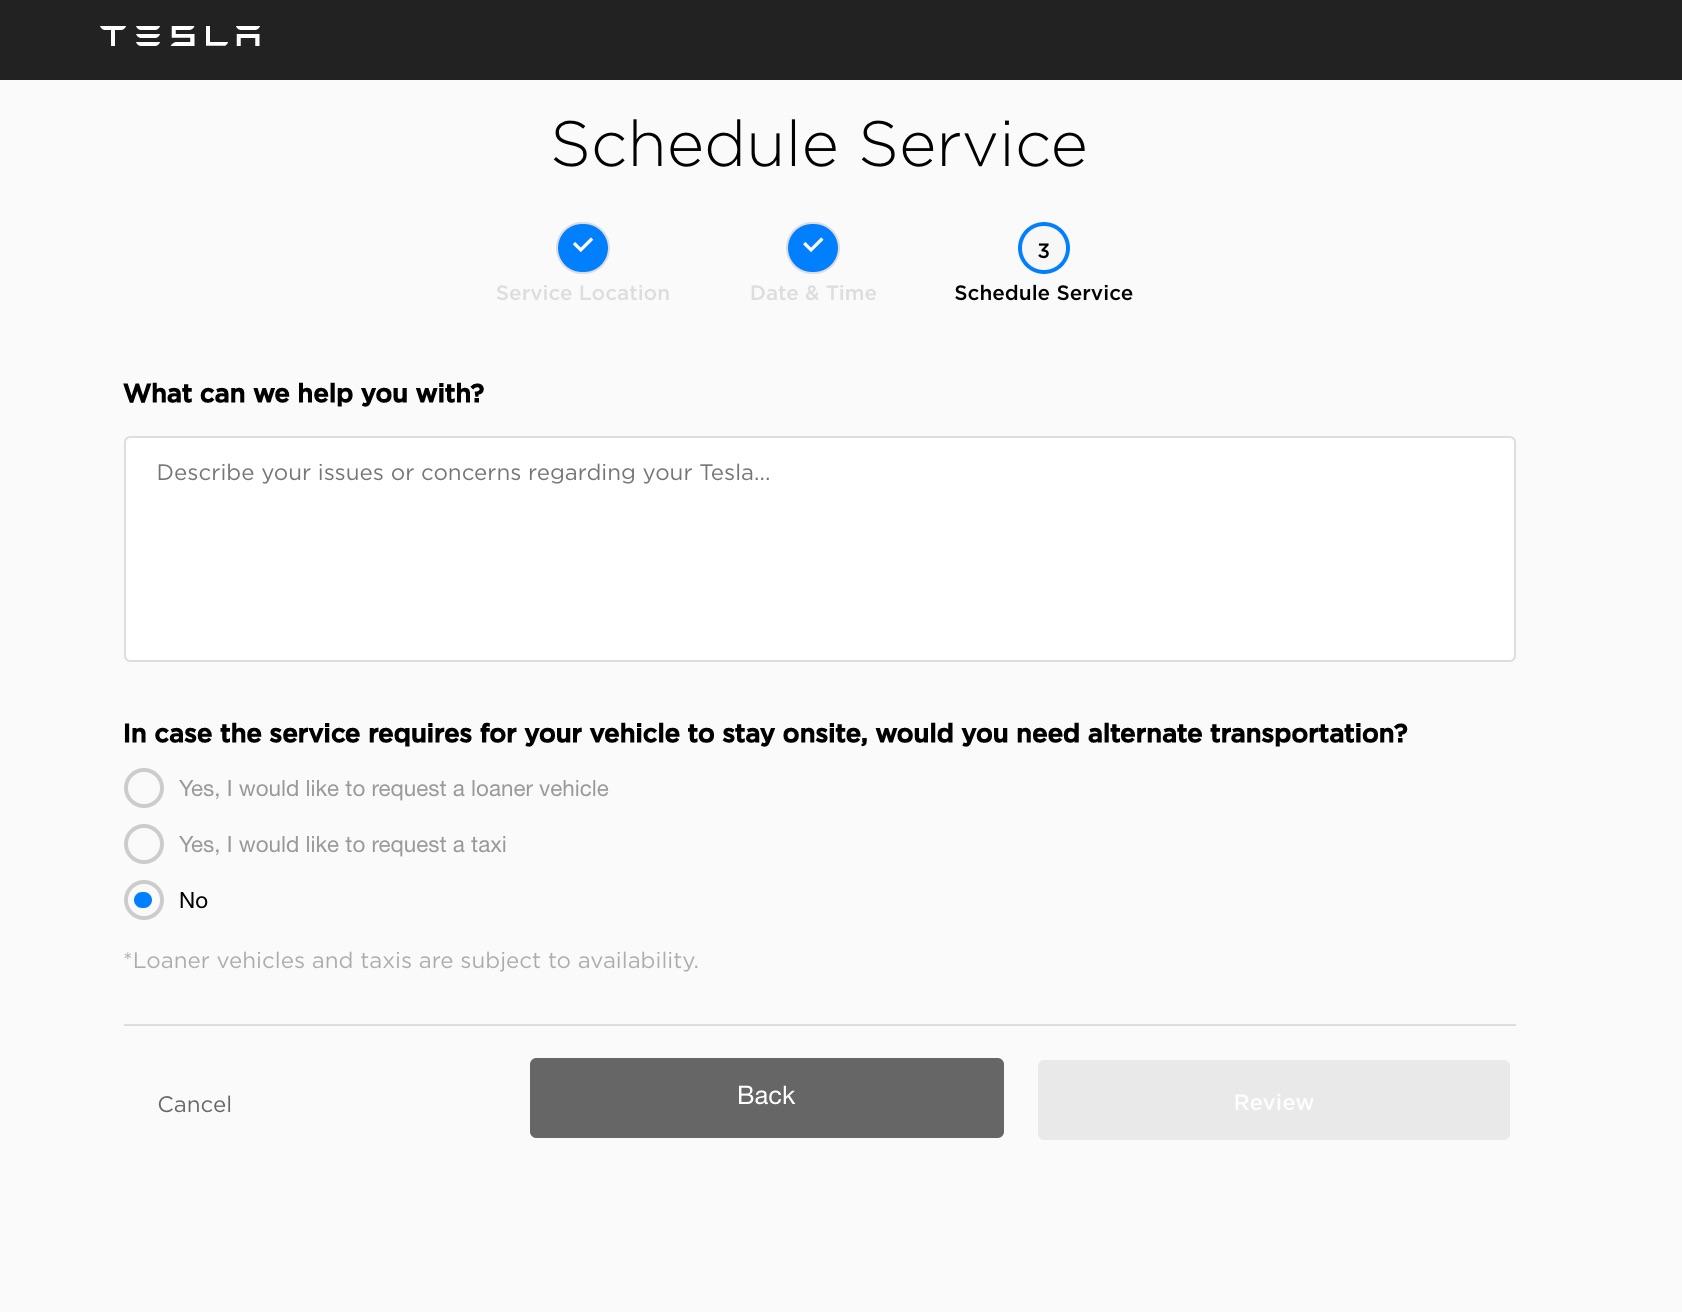 tesla-service-online-scheduling